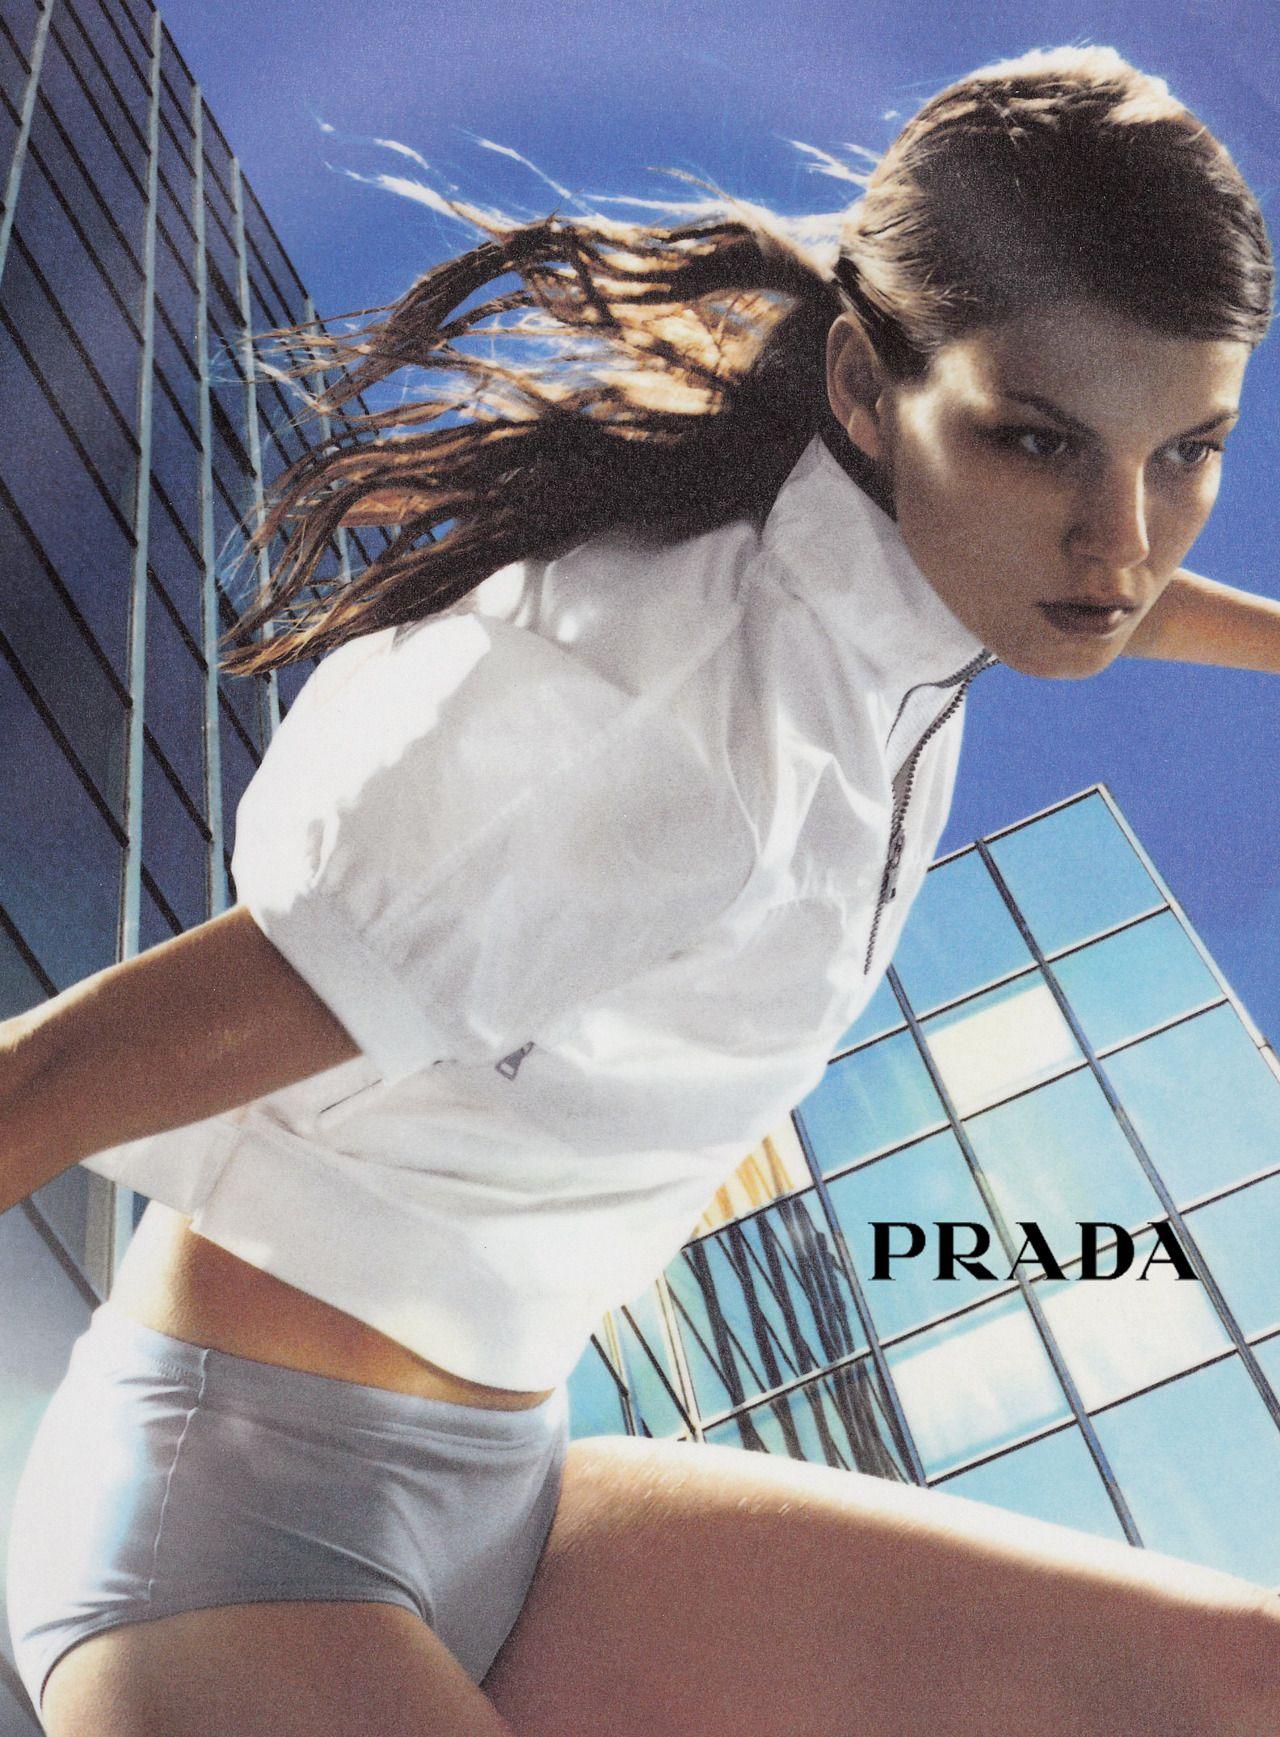 Angela Lindvall/Prada Sports Spring Summer 1999